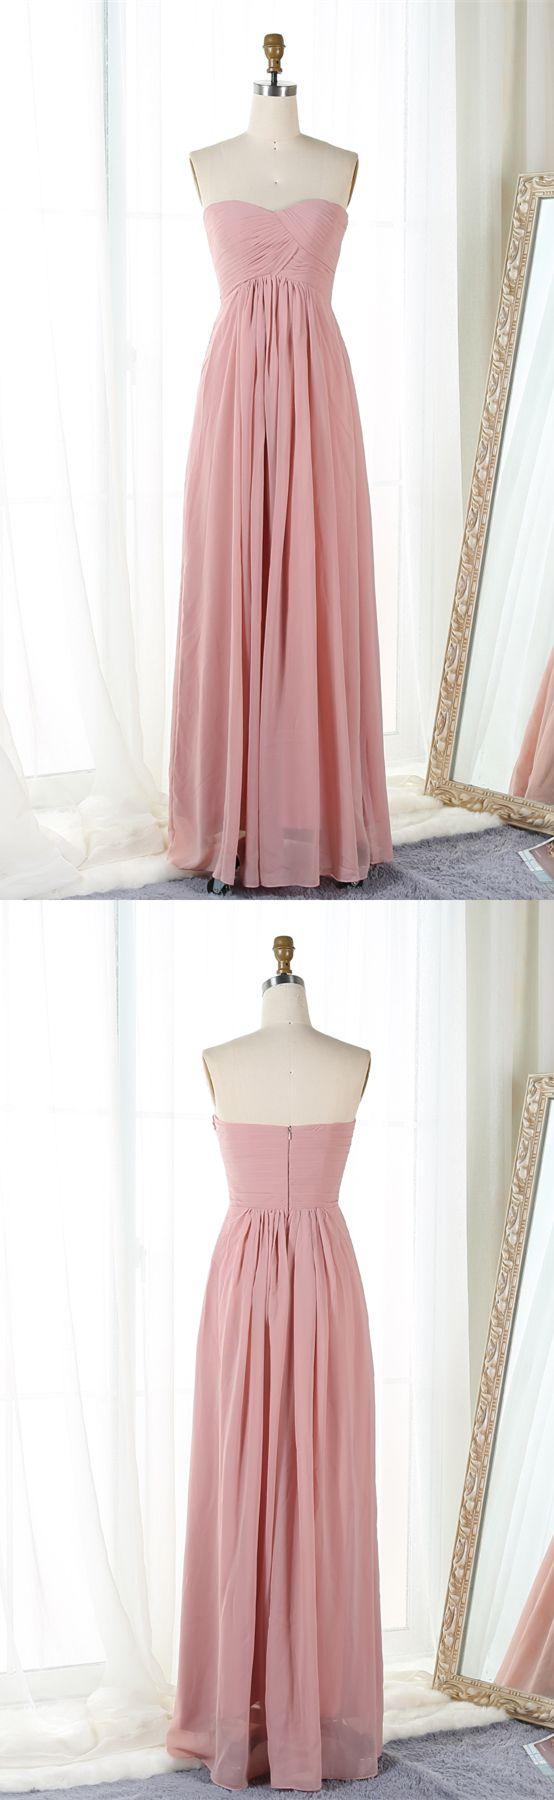 simple blush long prom dresses,elegant chiffon bridesmaid dress,sweatheart  dress for bridesmaids under $50,buy two get one free